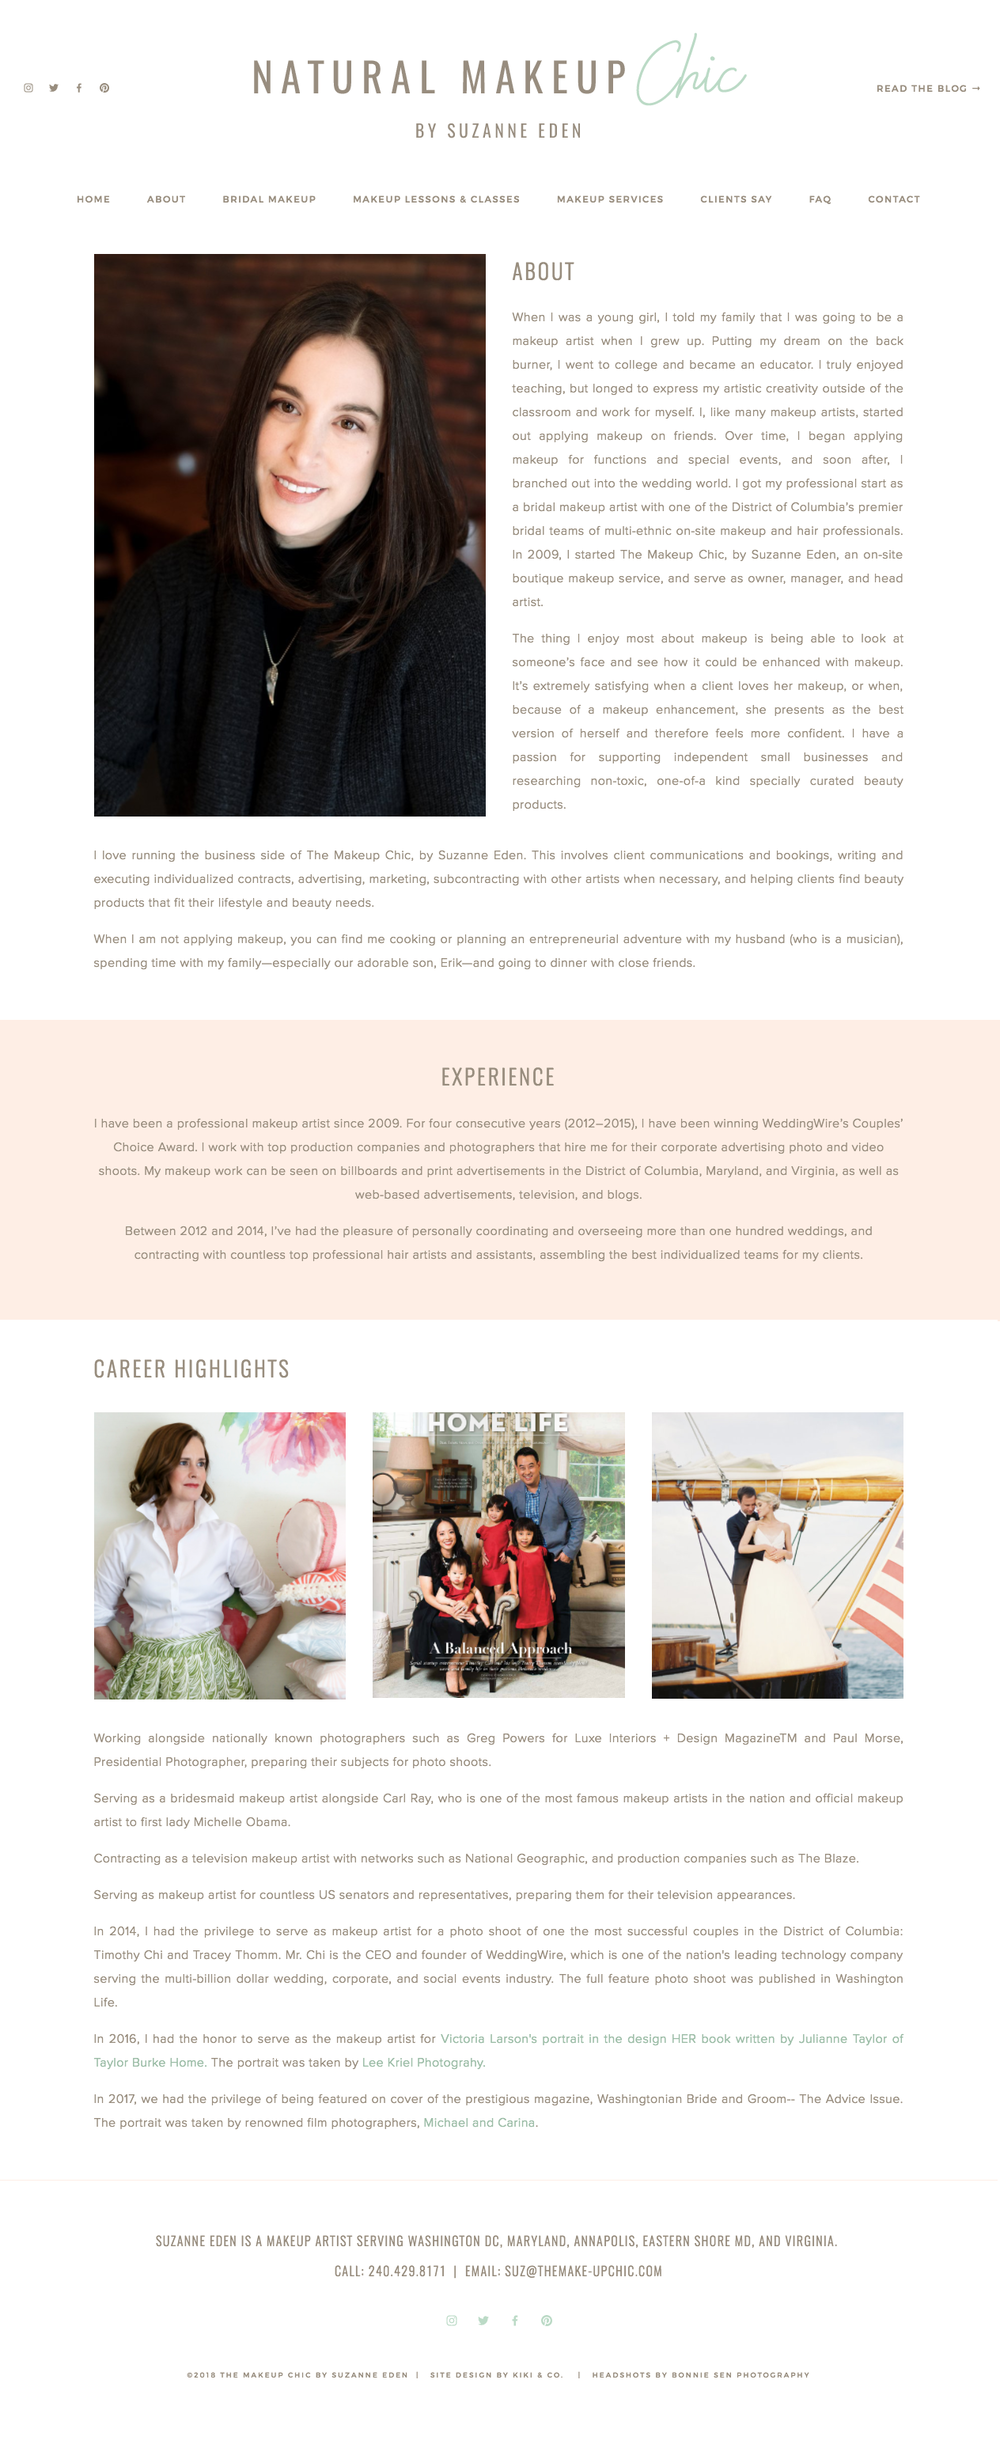 Site design by Kiki Co. Creative